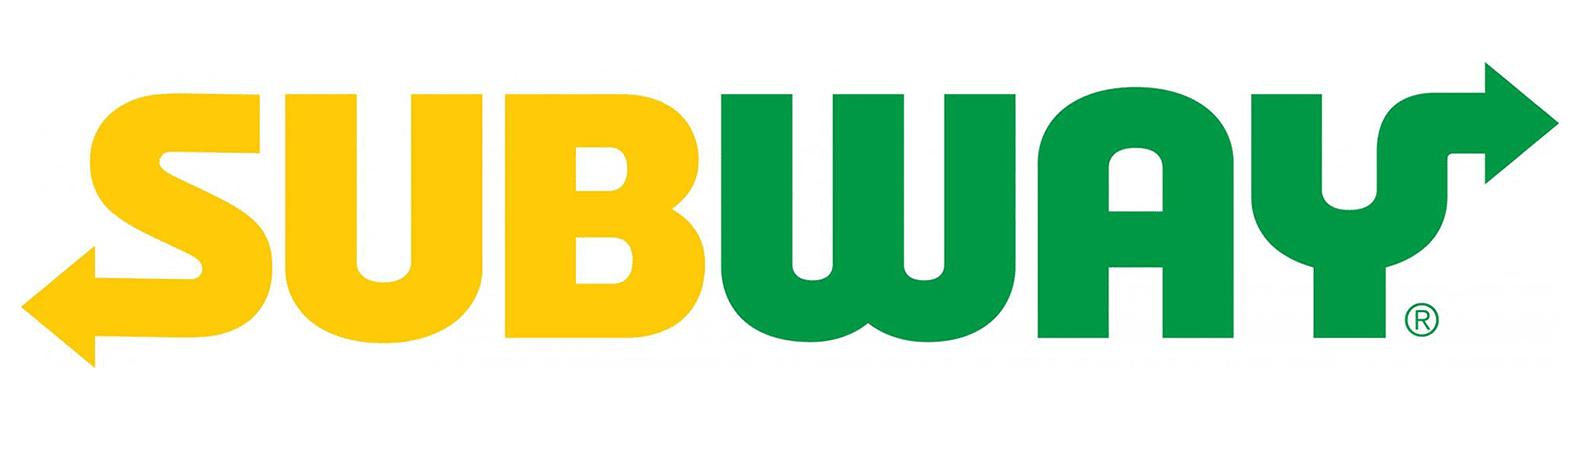 png 1580x460 Subway logo background - Subway PNG